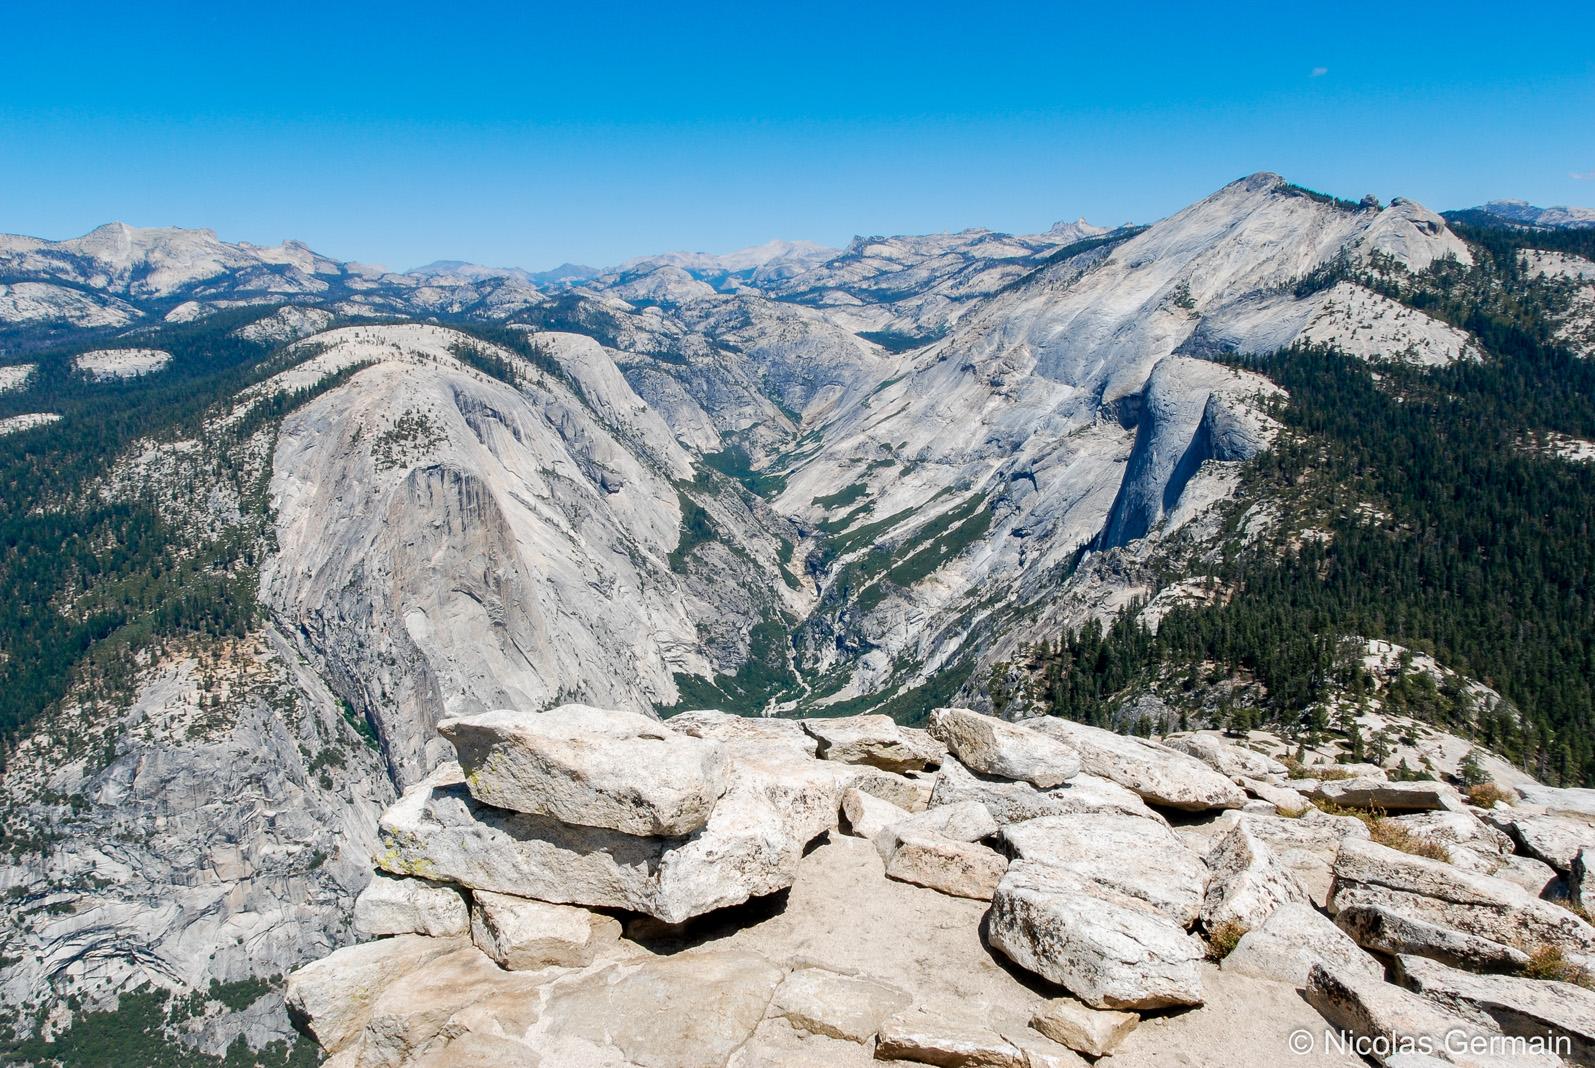 Panorama de Yosemite vu du sommet du Half Dome